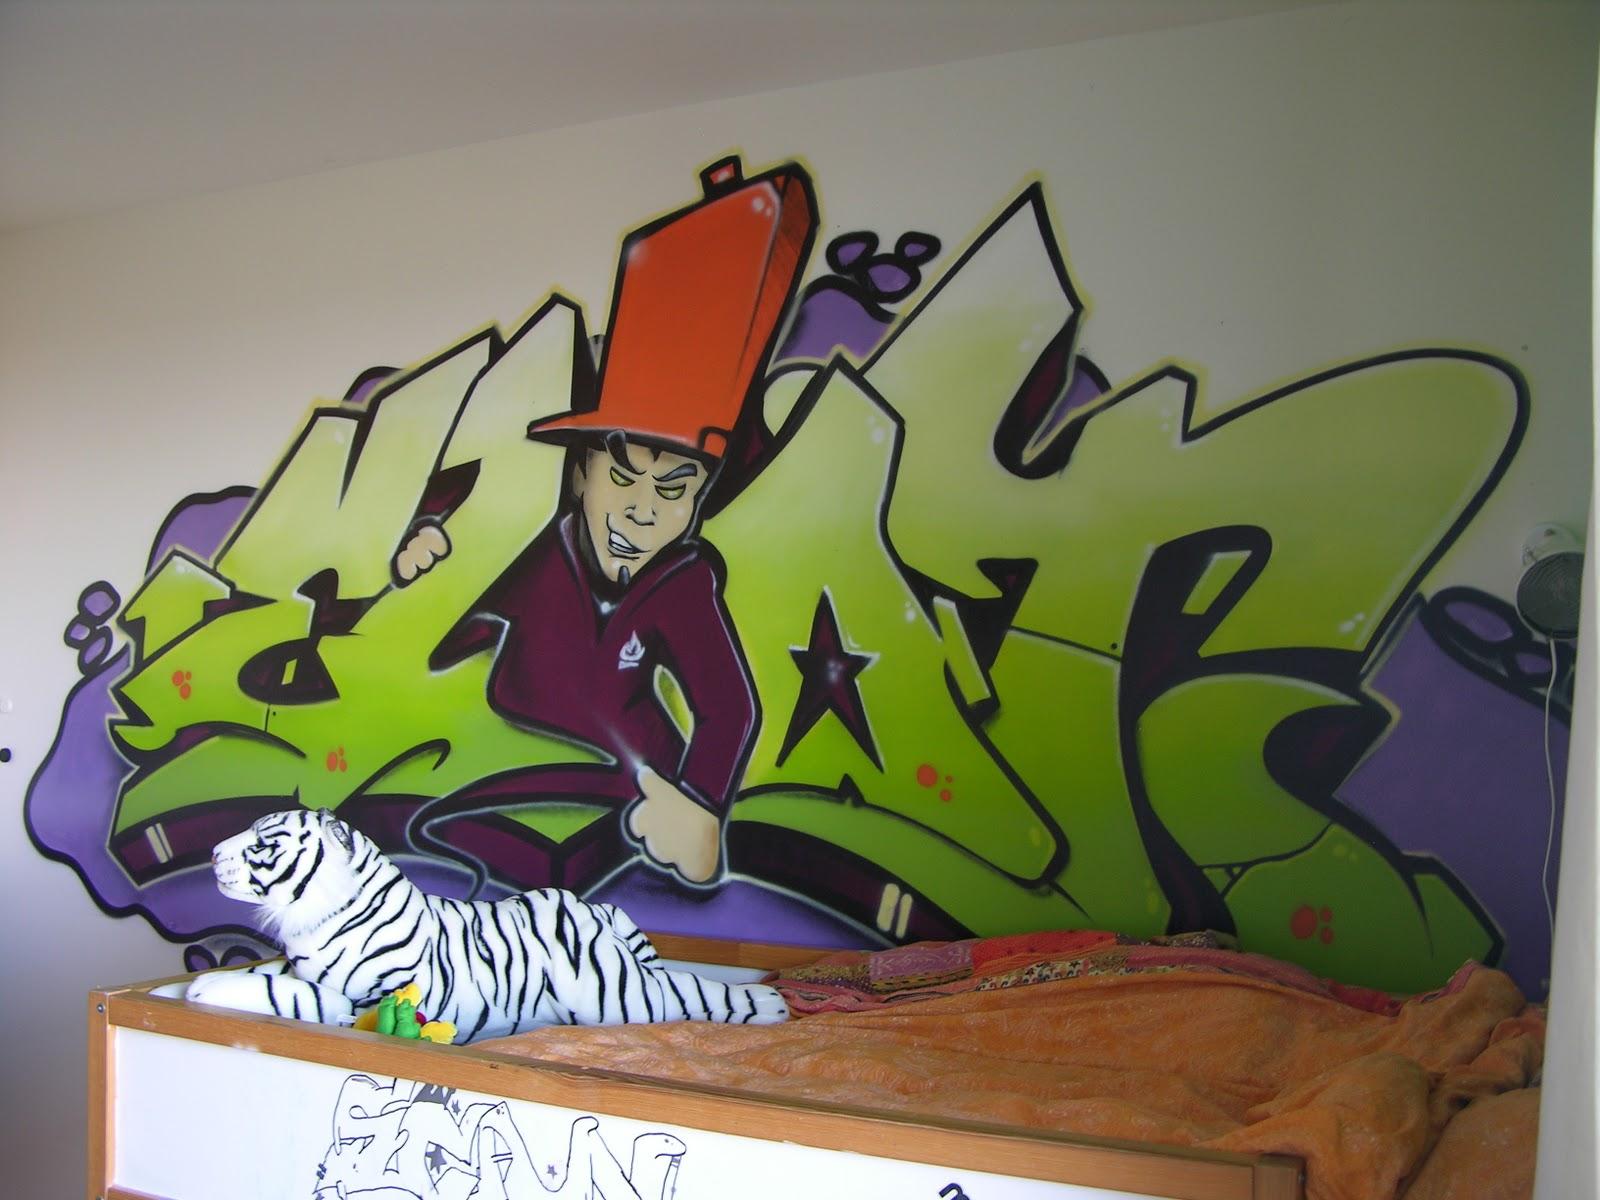 basel vorname graff graffiti zimmergraffiti graffitisprayer graffitikunstler charakter. Black Bedroom Furniture Sets. Home Design Ideas